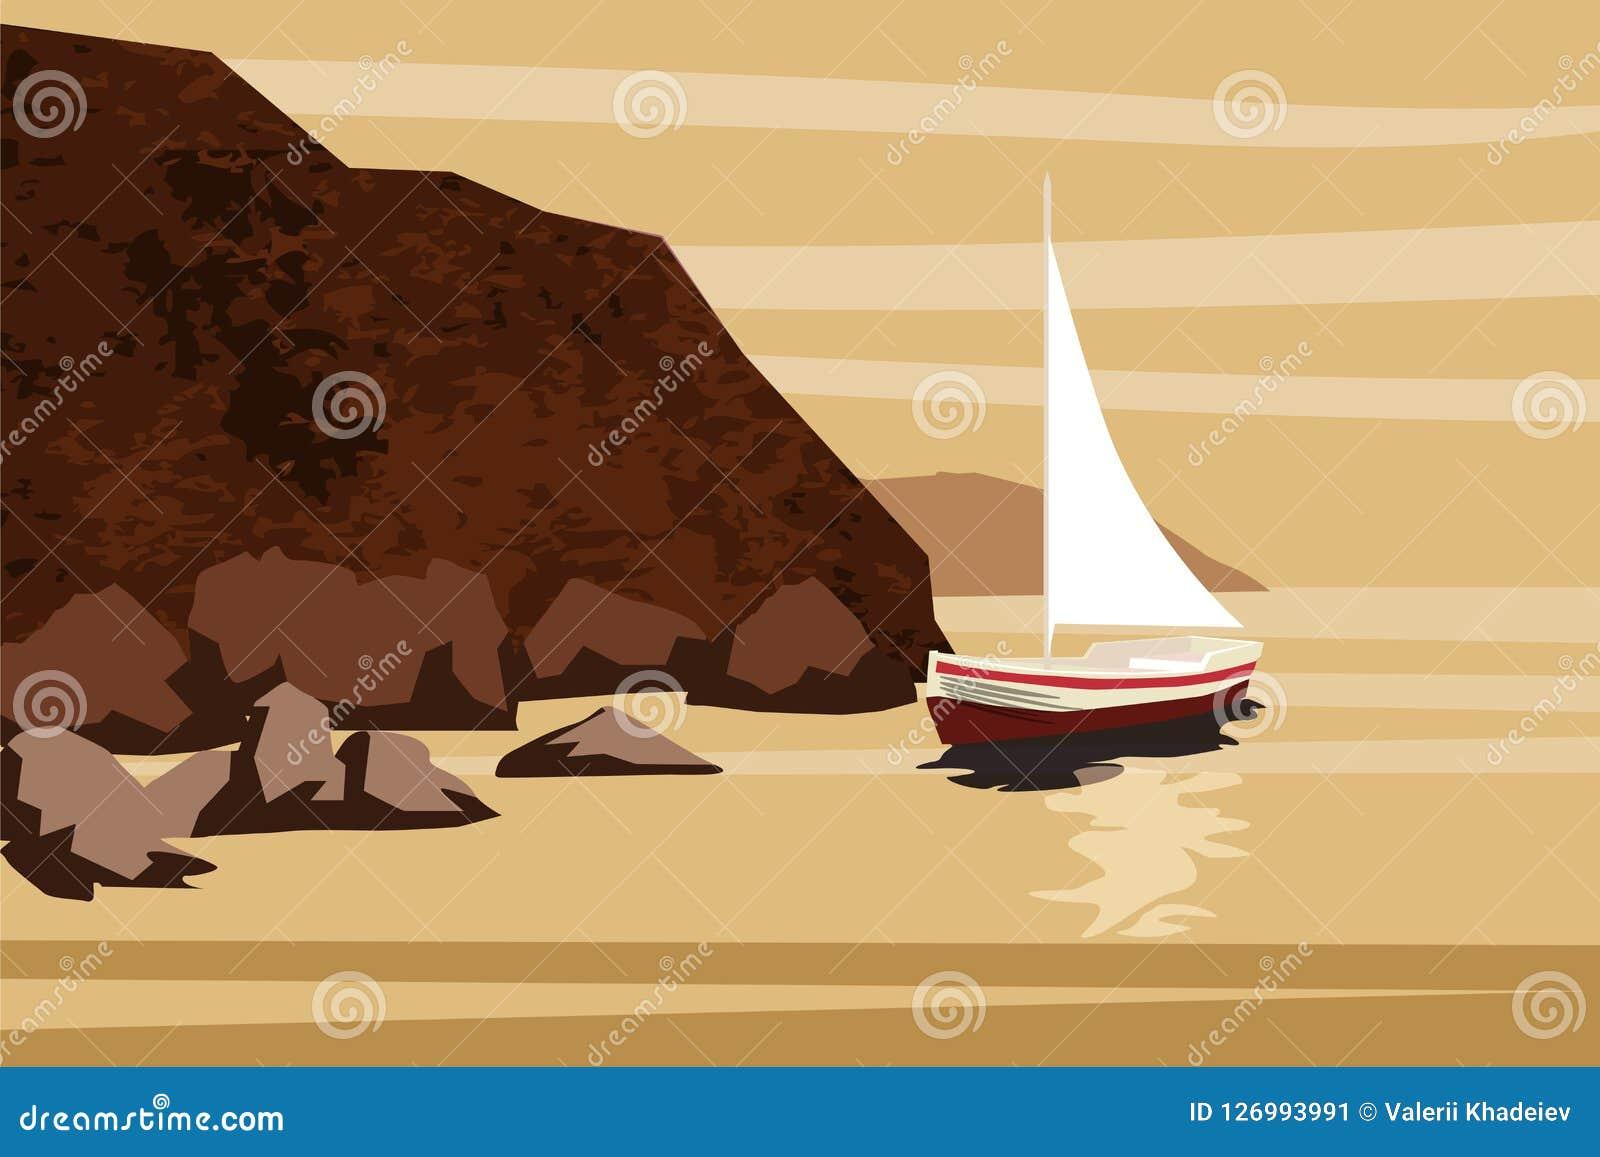 Seascape, sea, ocean, rocks, stones, sailfish, boat, vector, illustration, isolated